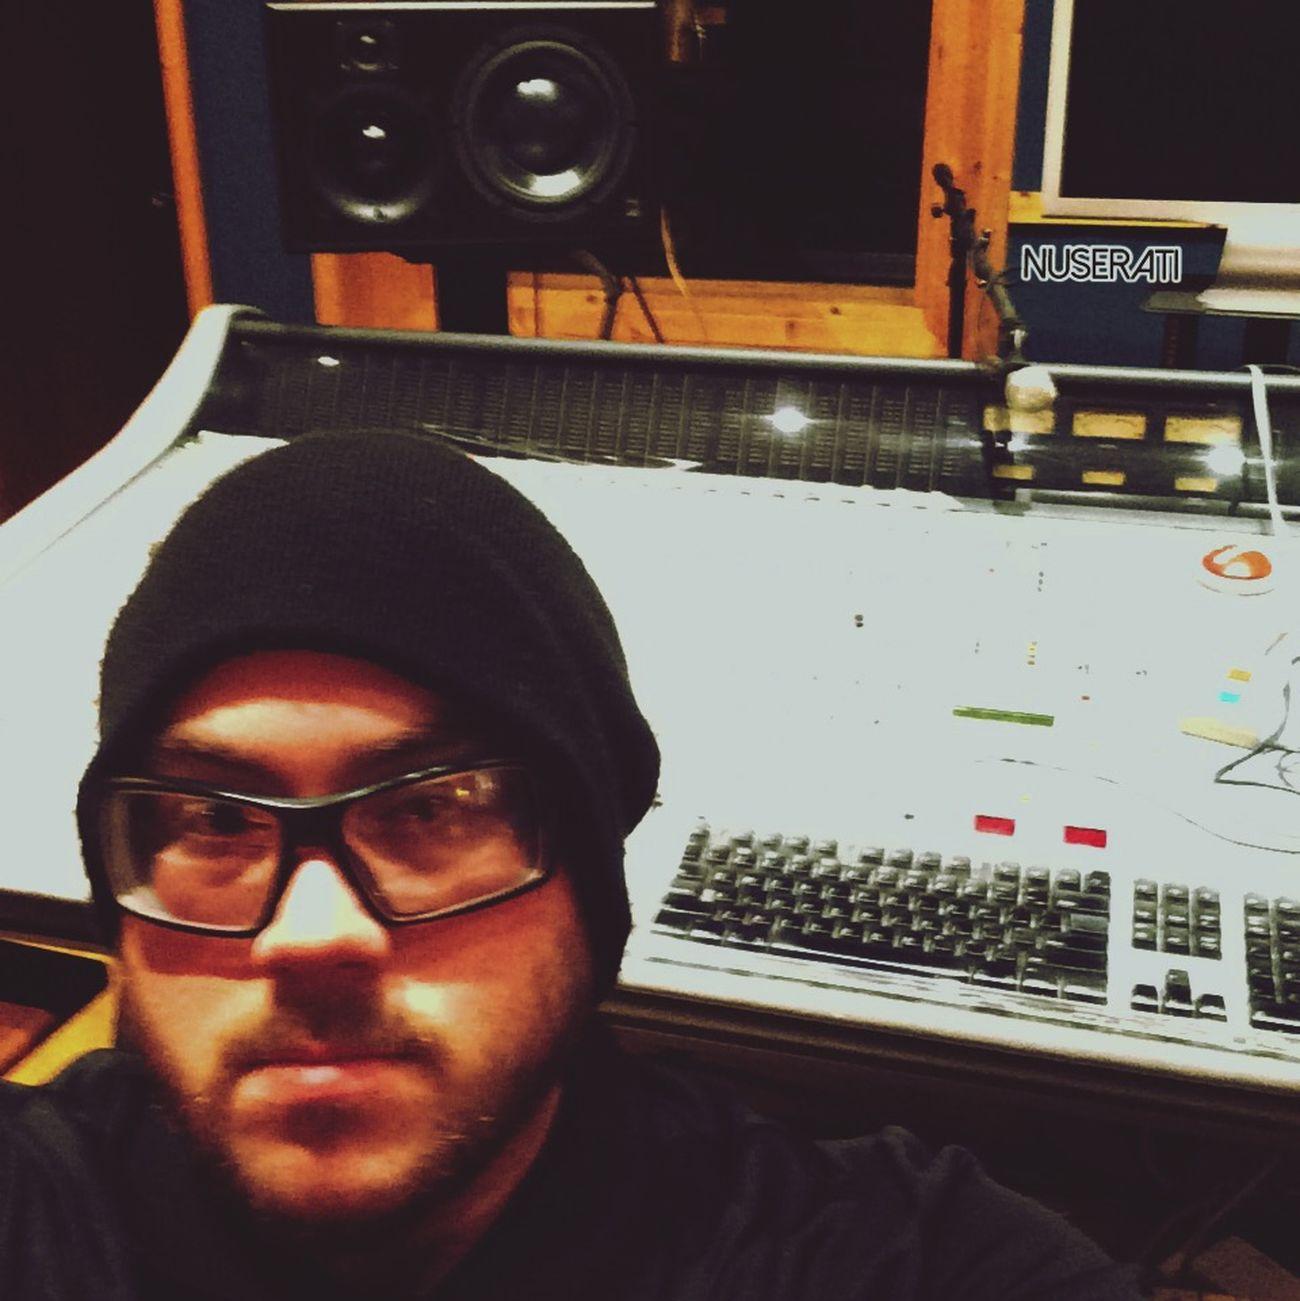 tudio| Jive Records Music Dj DjDiLusso Producer LetsGetIt NuSerati Edm Electro